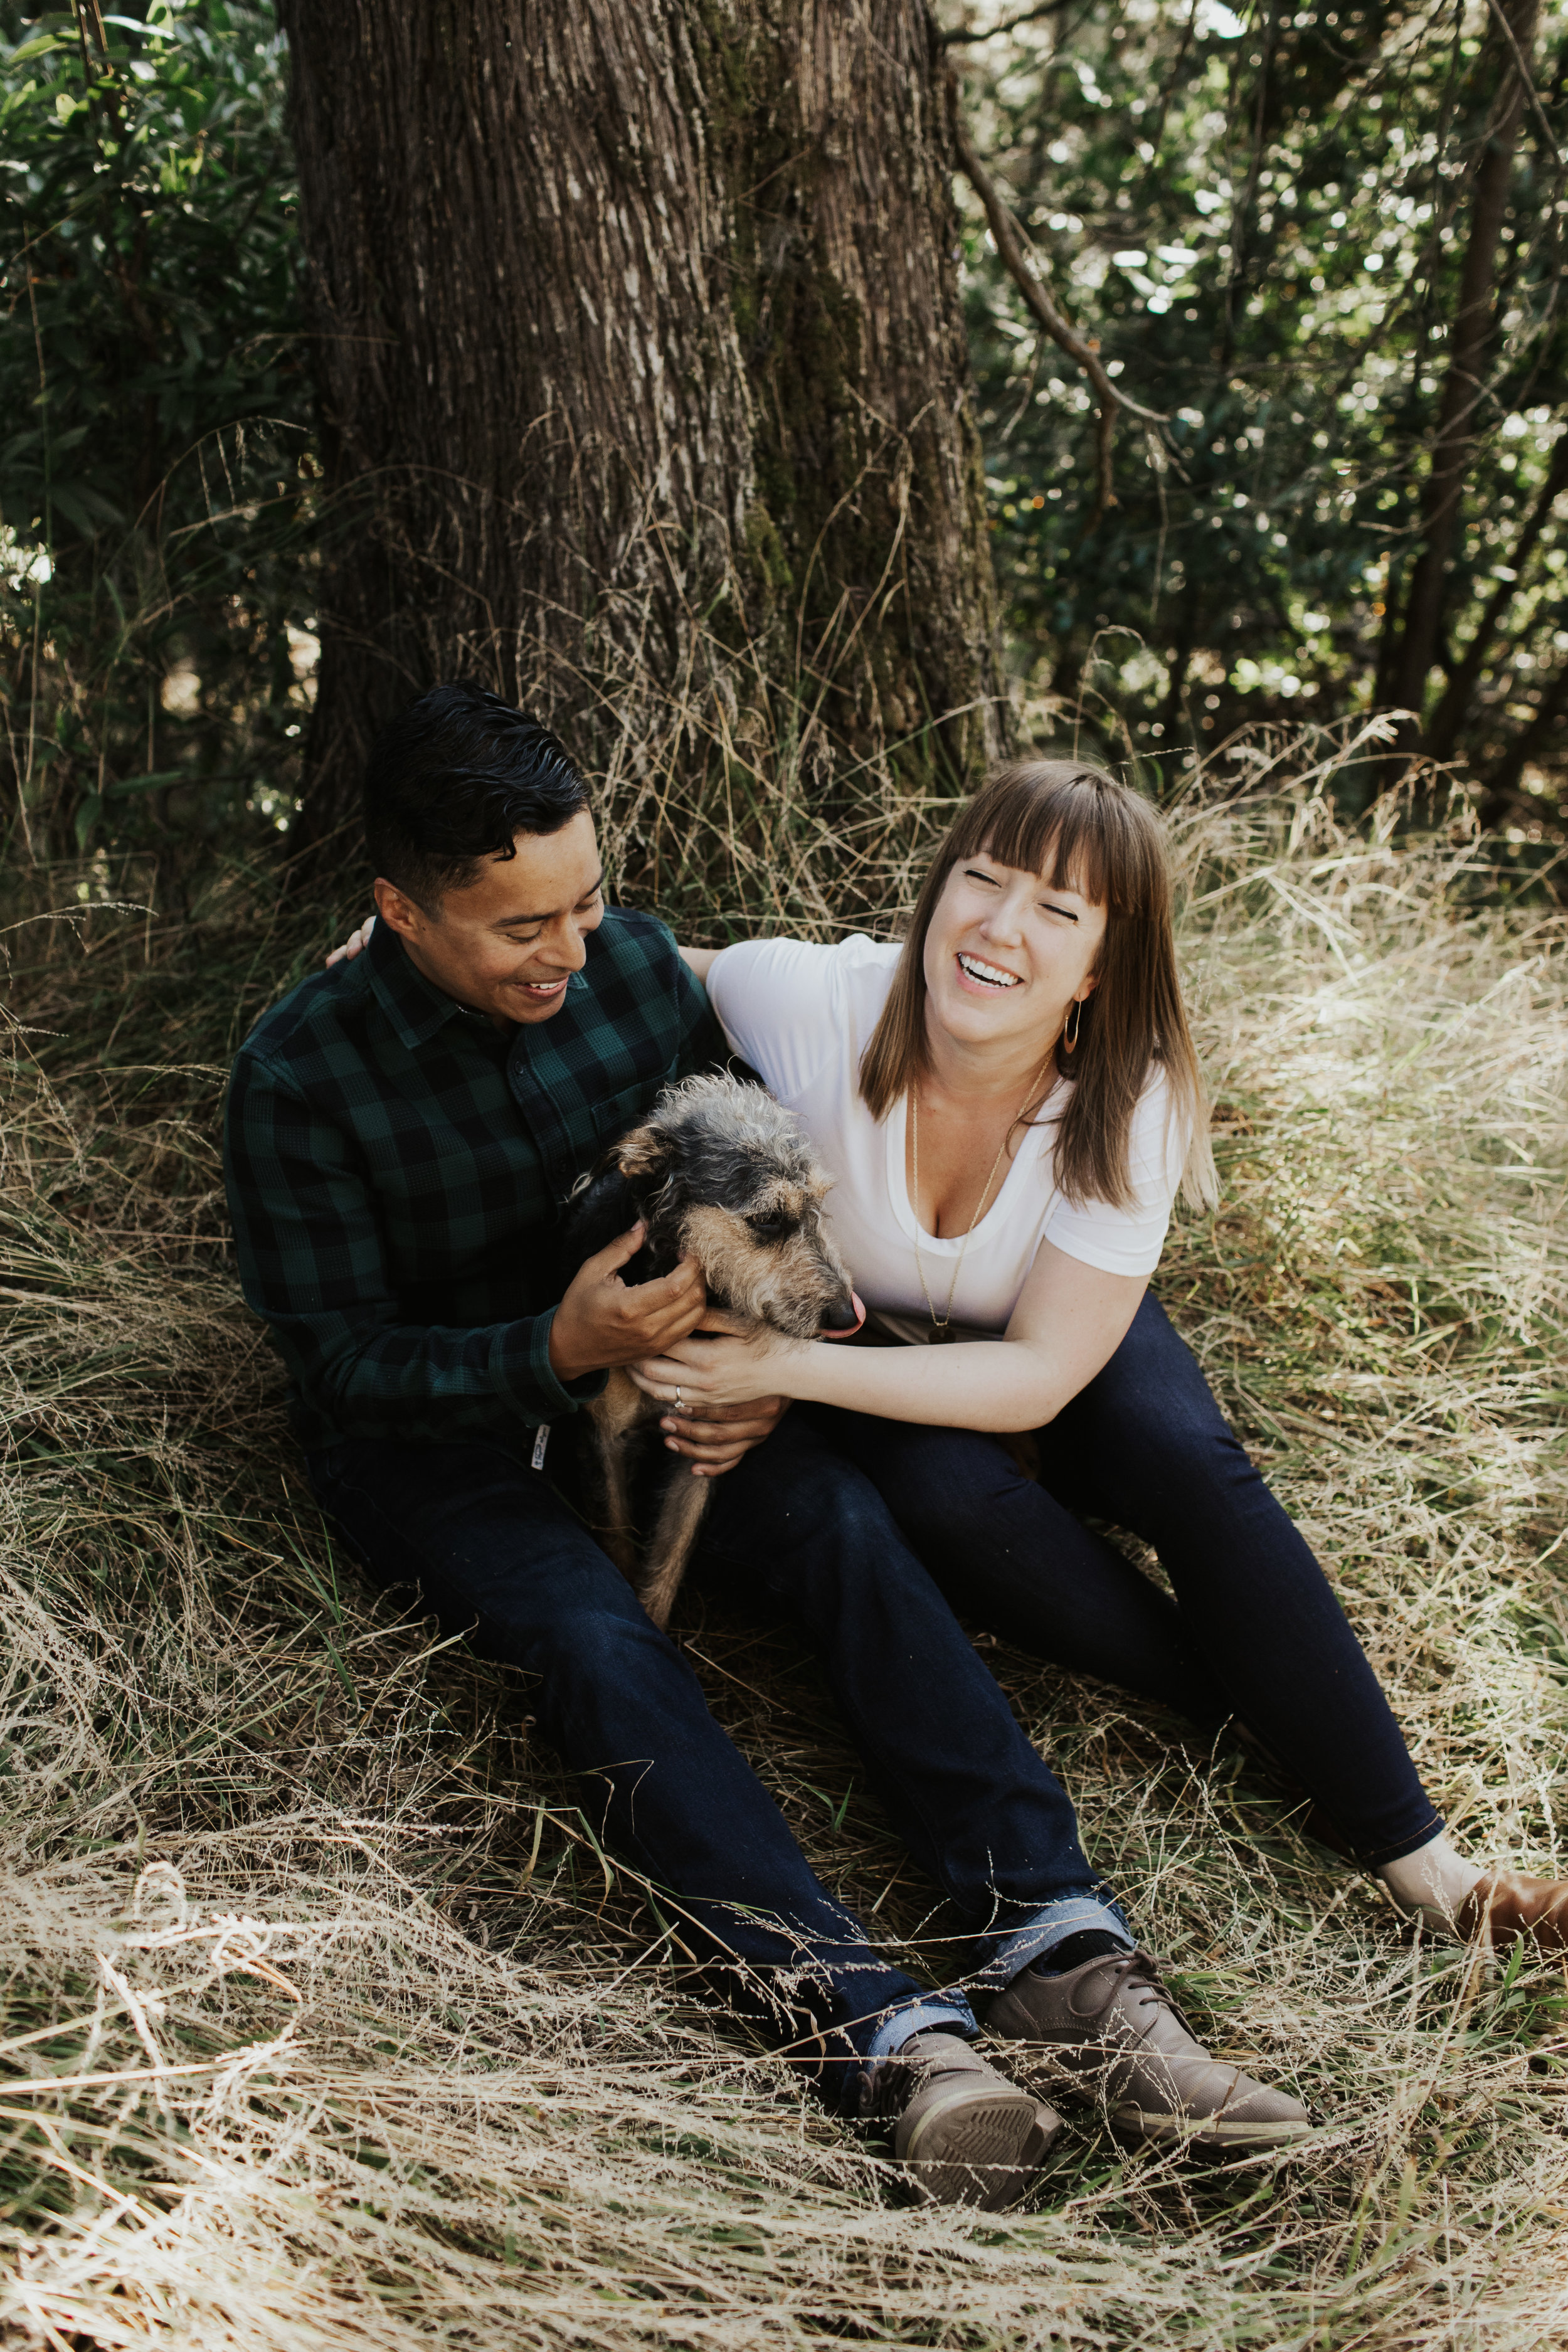 Erin-Rene-Kramer-Finished-San-Francisco-Redwoods-Legion-of-Honor-Sutro-Baths-Engagement-Session-with-Dog-38.jpg